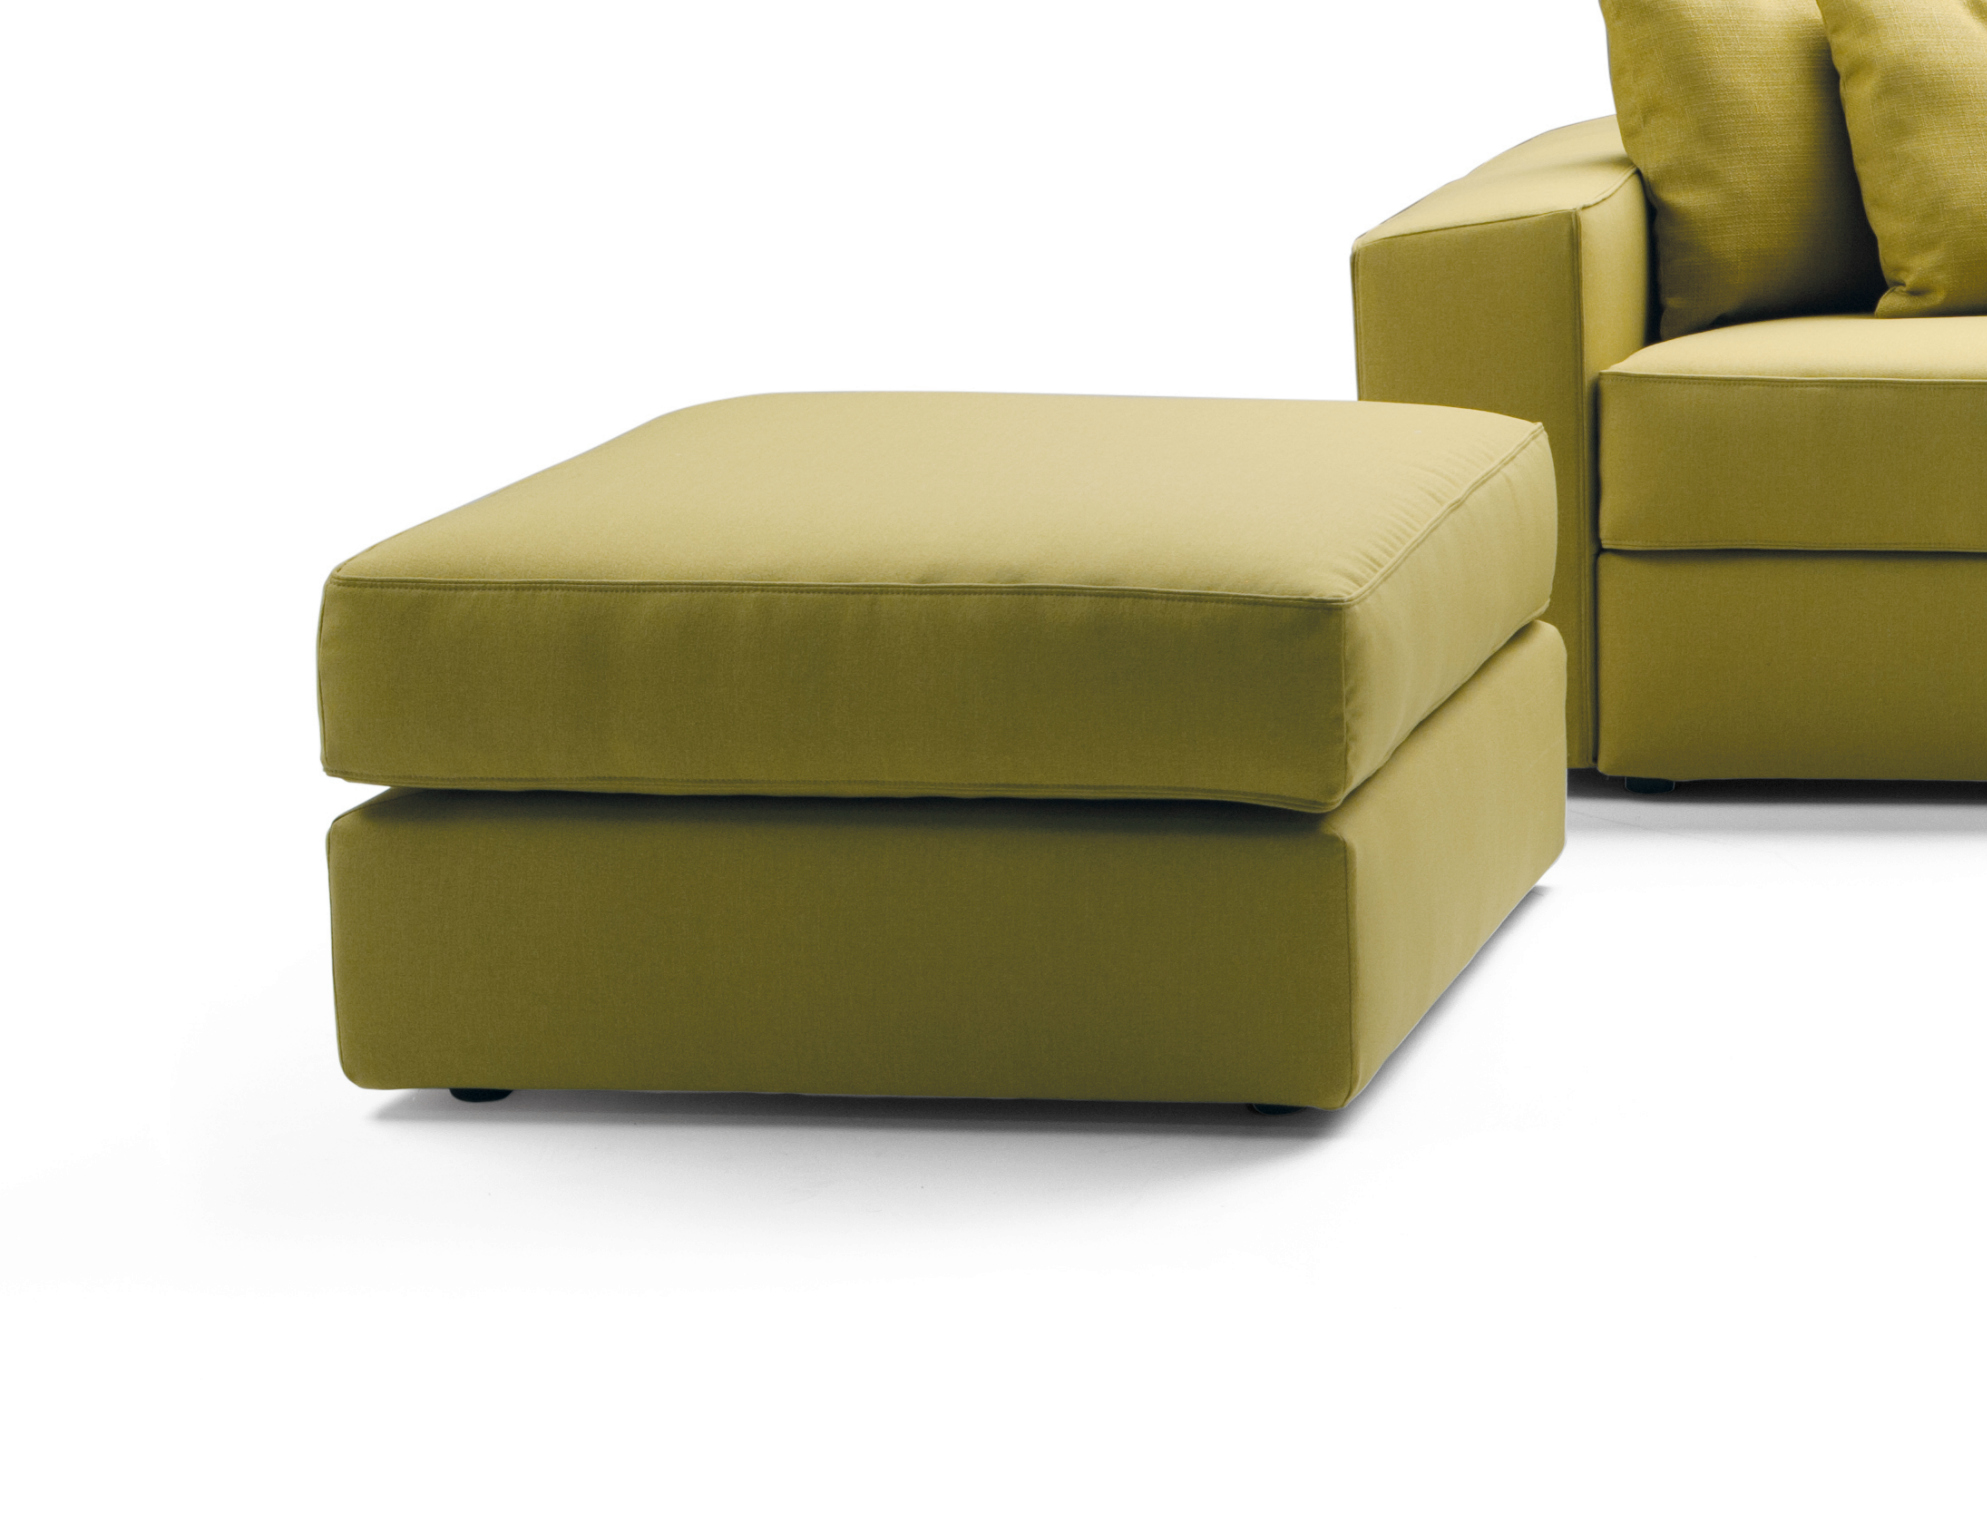 melvin pouf melvin collection by milano bedding design. Black Bedroom Furniture Sets. Home Design Ideas